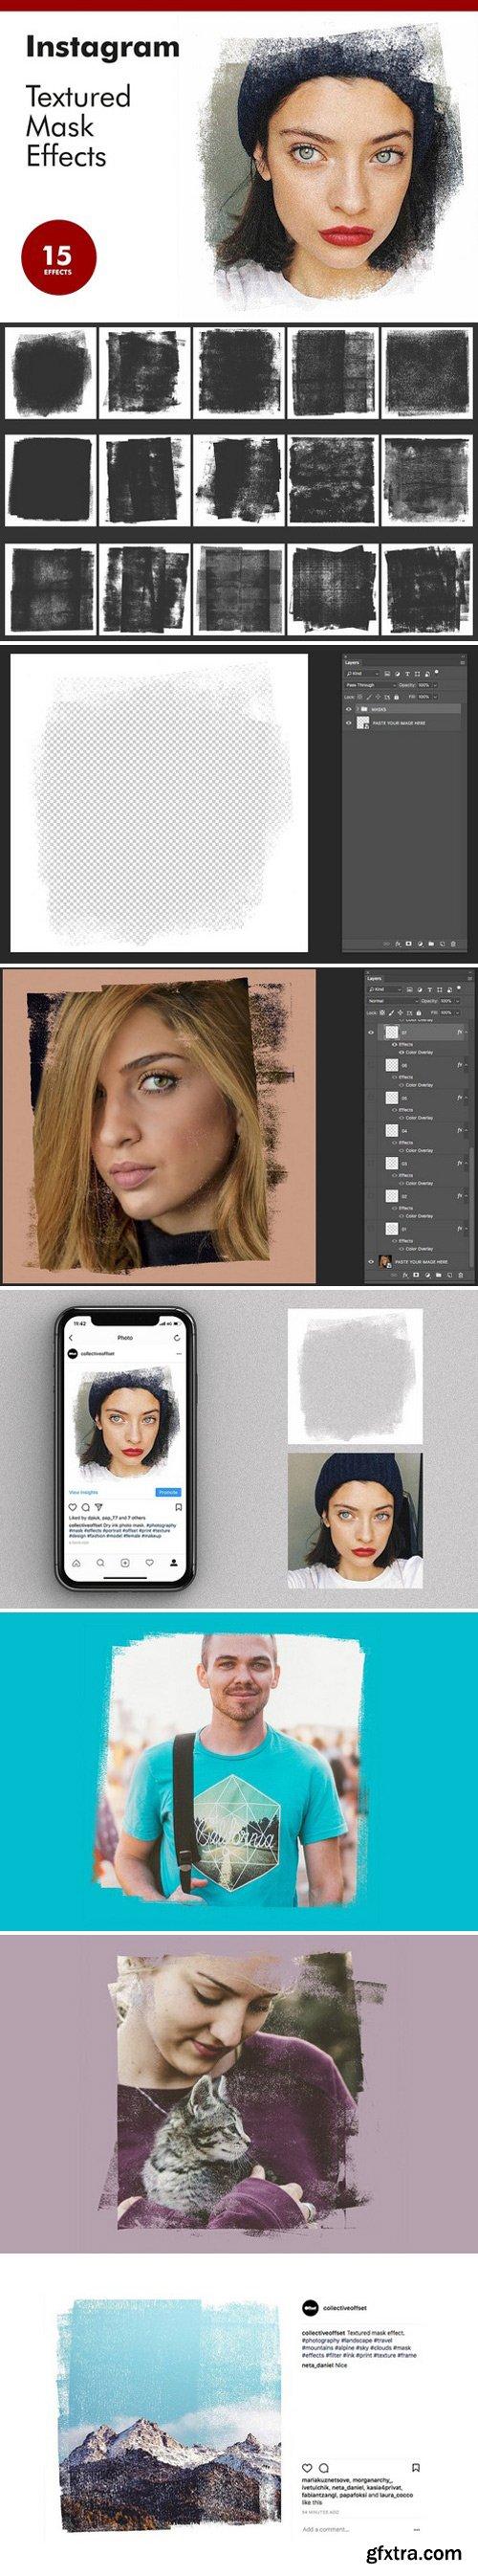 CM - Instagram Textured Mask Effects 2367269